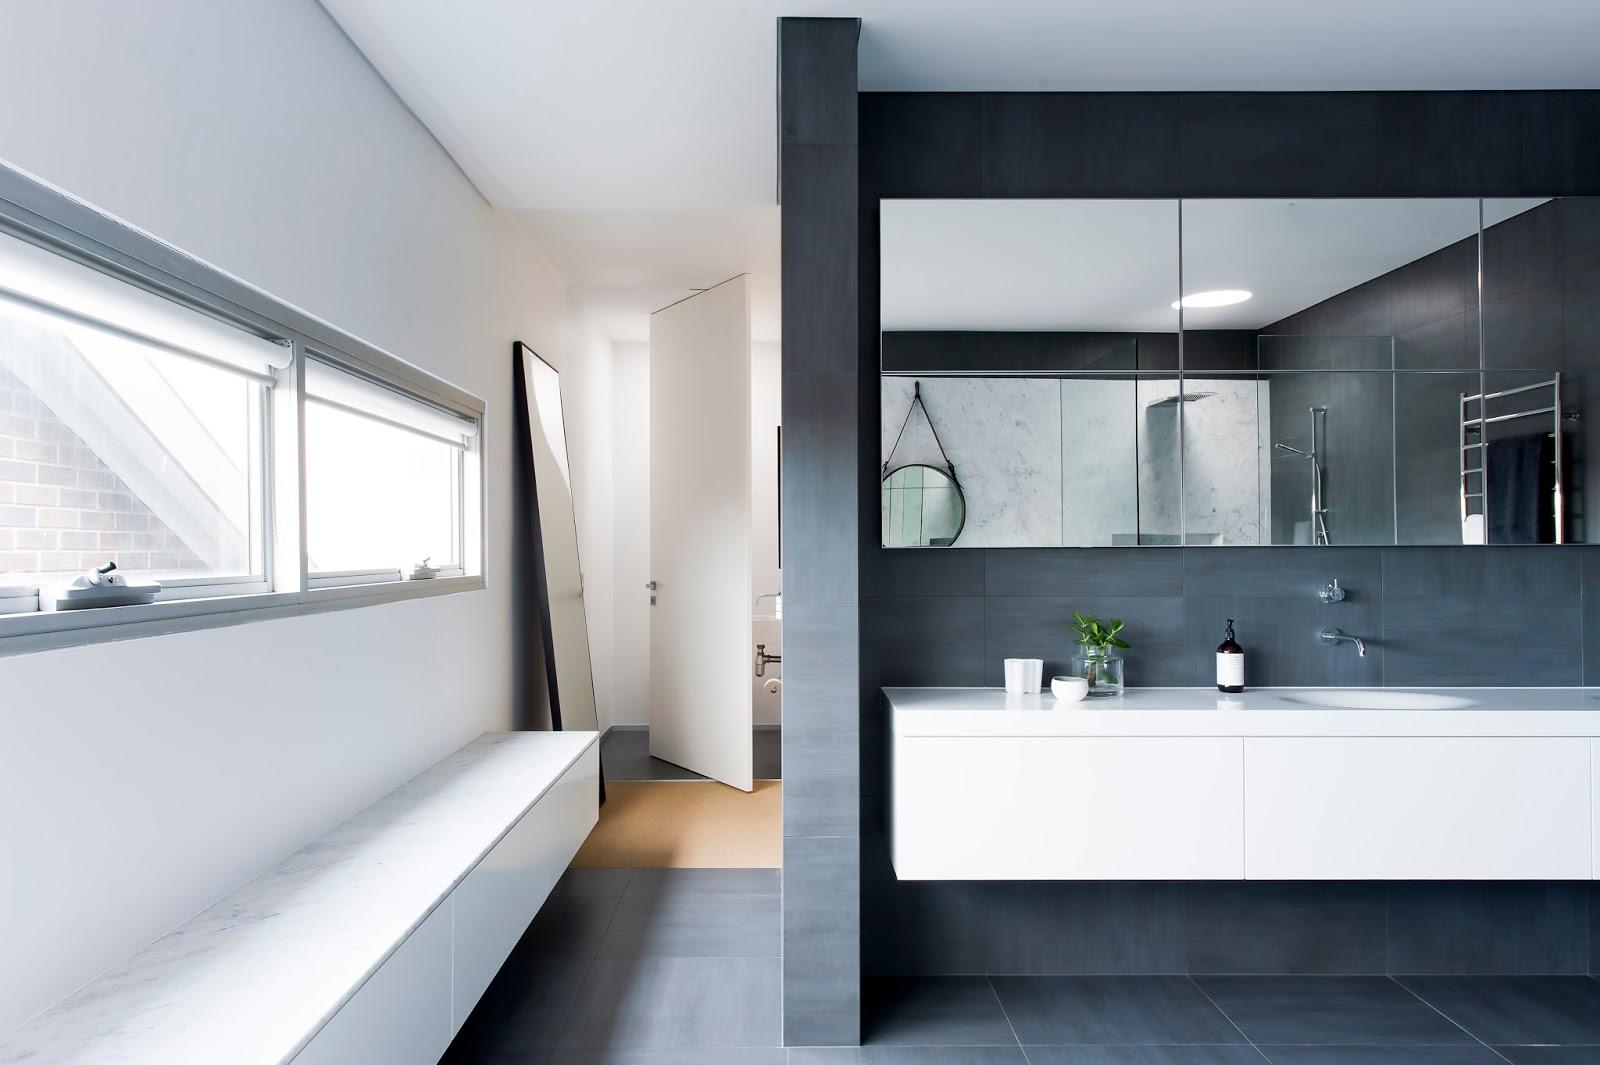 Minosa: Understated elegance creates a stunning bathroom. on zebra design for bathroom, zen design furniture, zen design bedroom, urban design for bathroom, zen design living room, home design for bathroom, zen design kitchen, kitchen cabinets for bathroom,